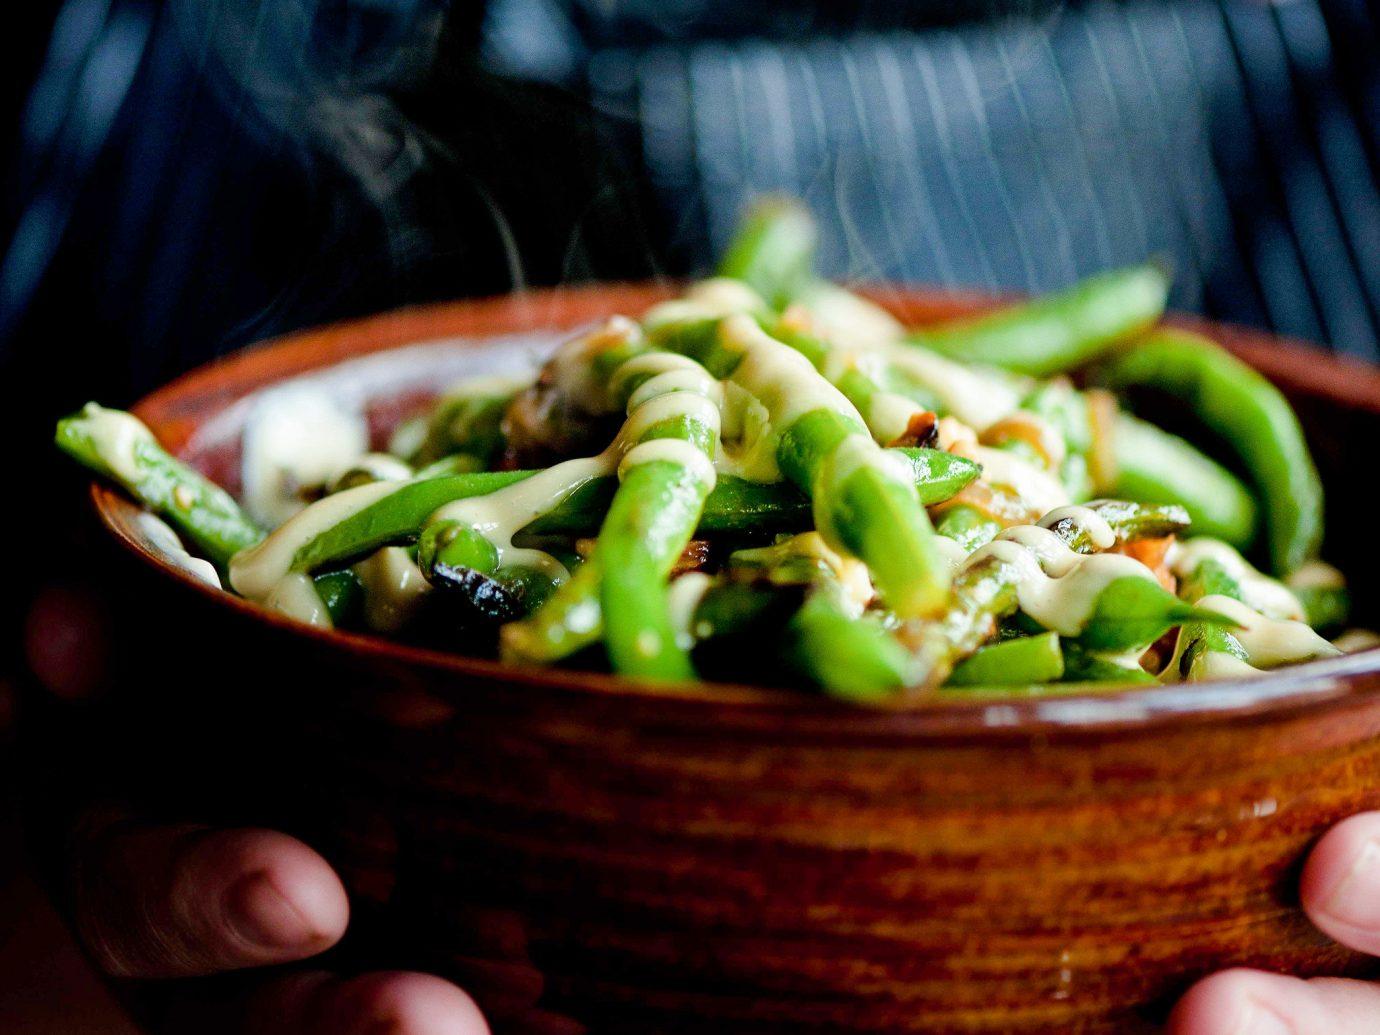 Food + Drink person food bowl indoor dish vegetable vegetarian food cuisine hand recipe asian food leaf vegetable